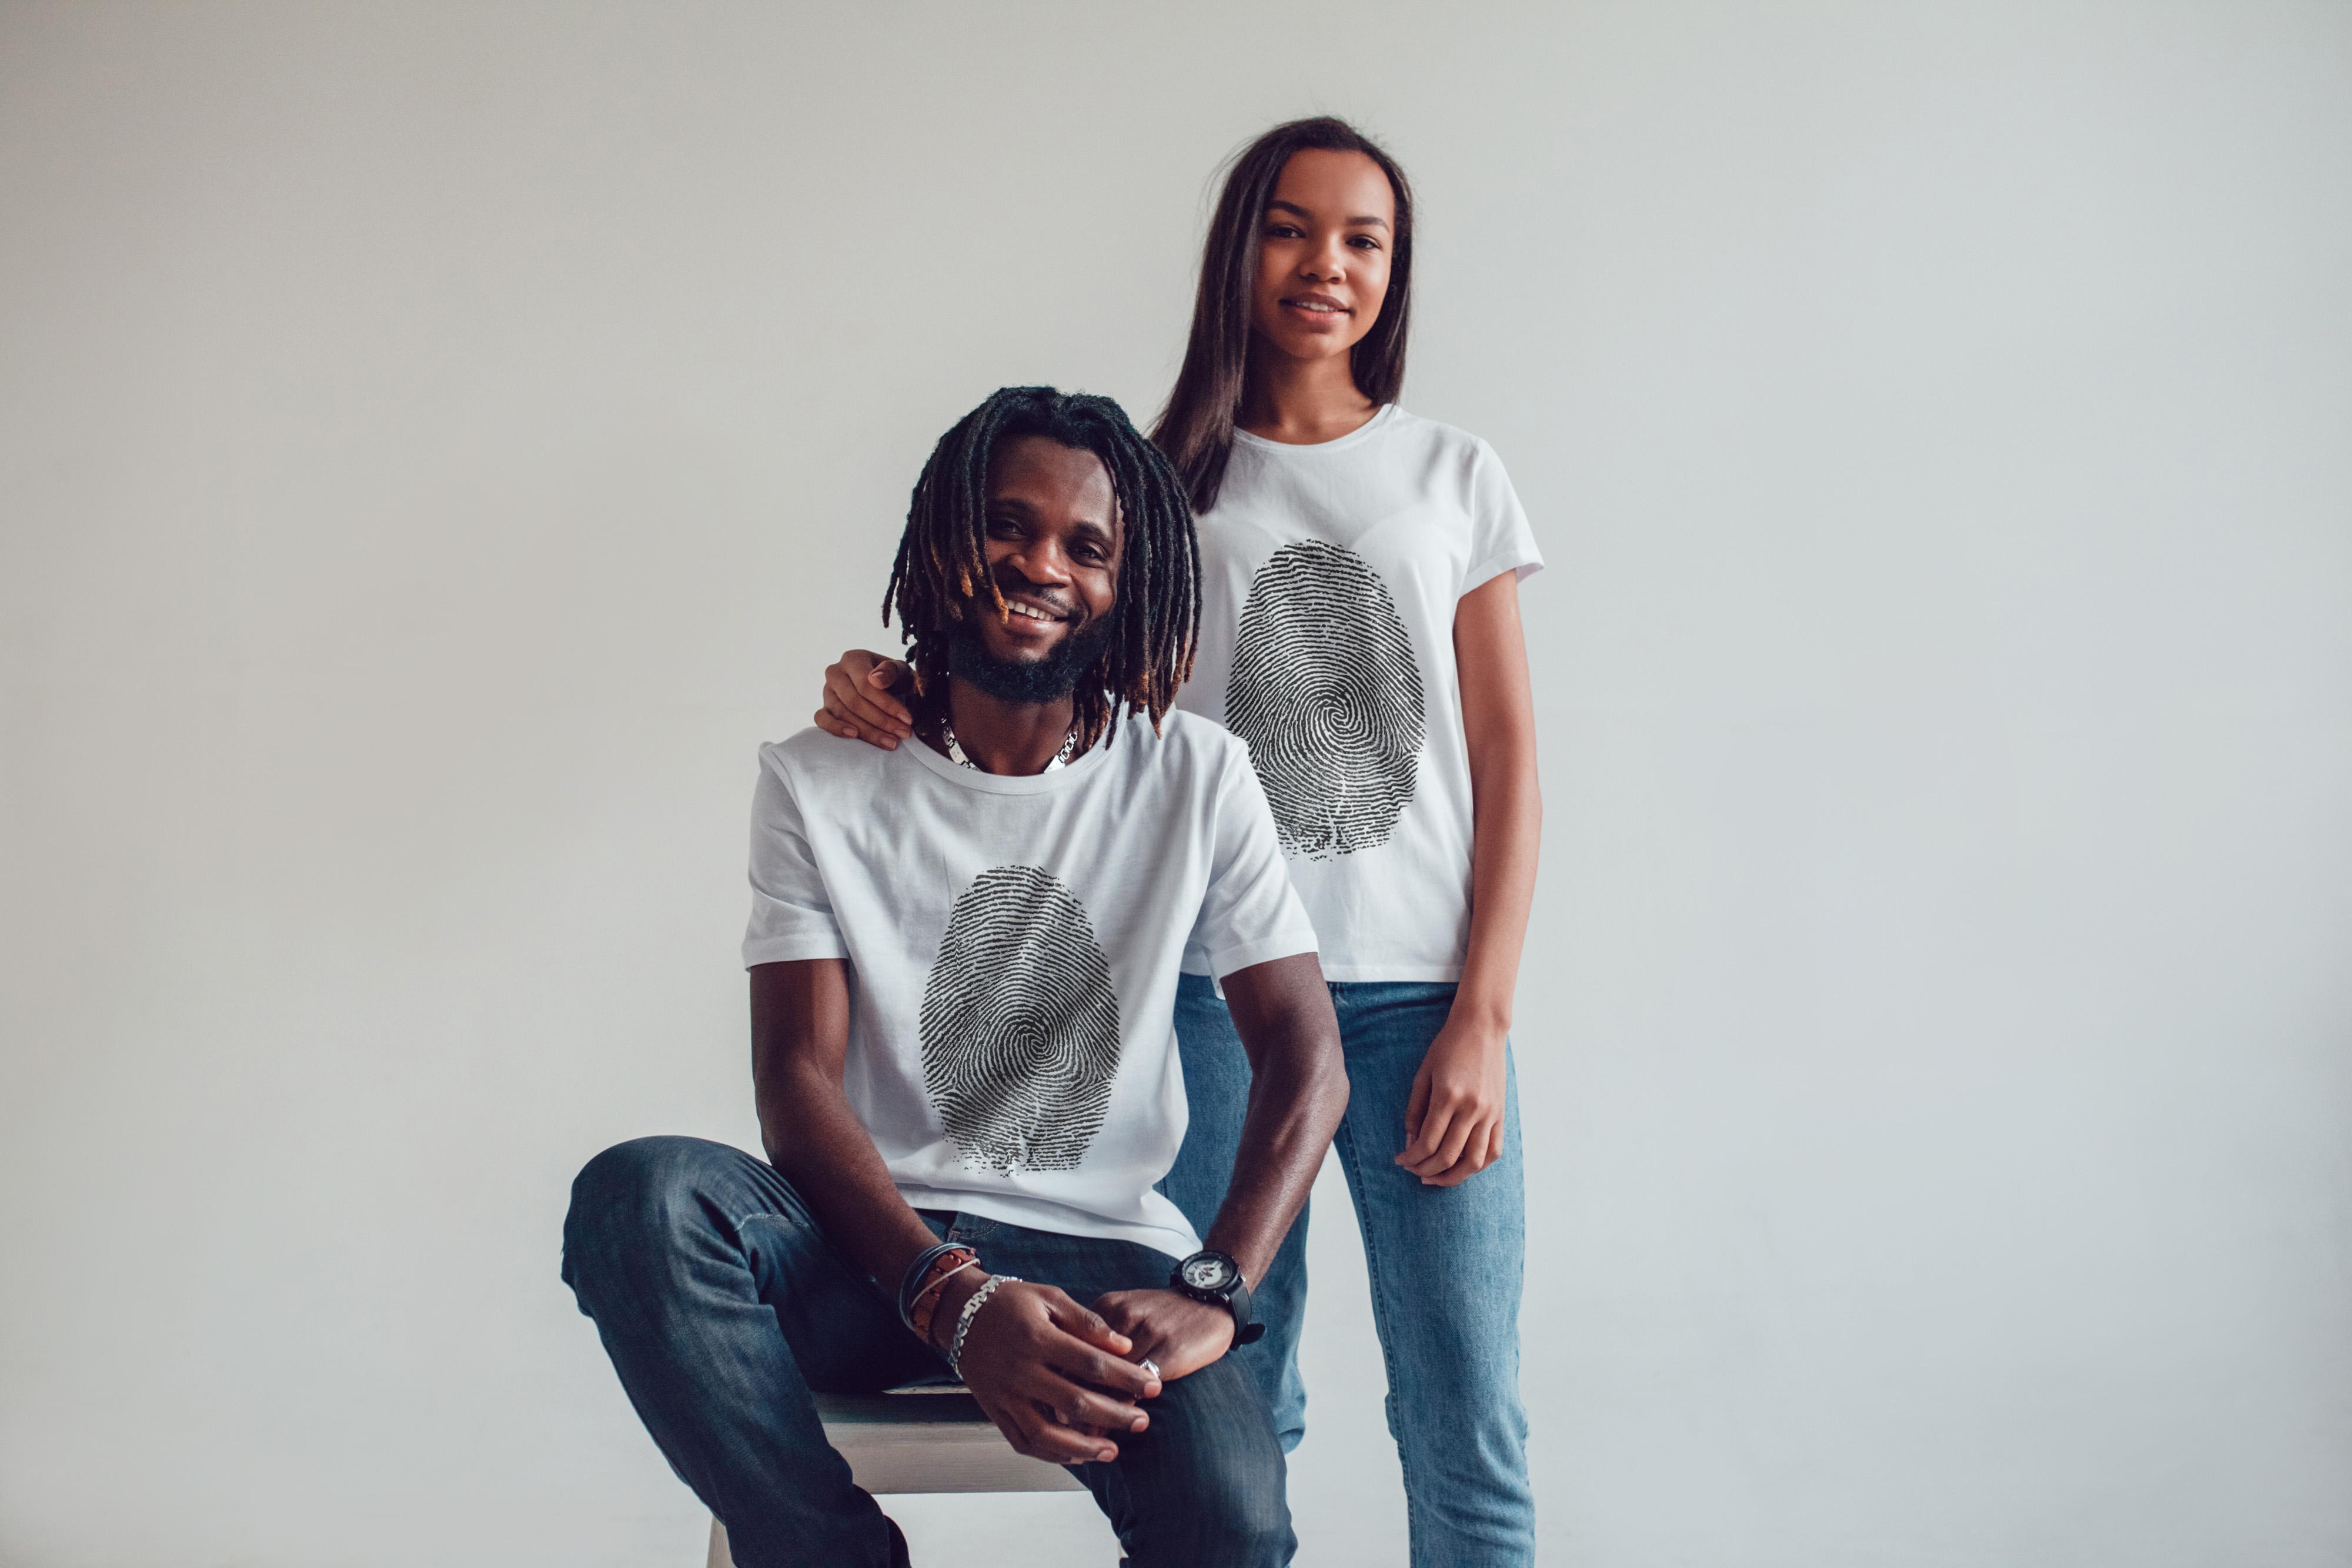 T-Shirt Mock-Up 2018 #1 example image 3